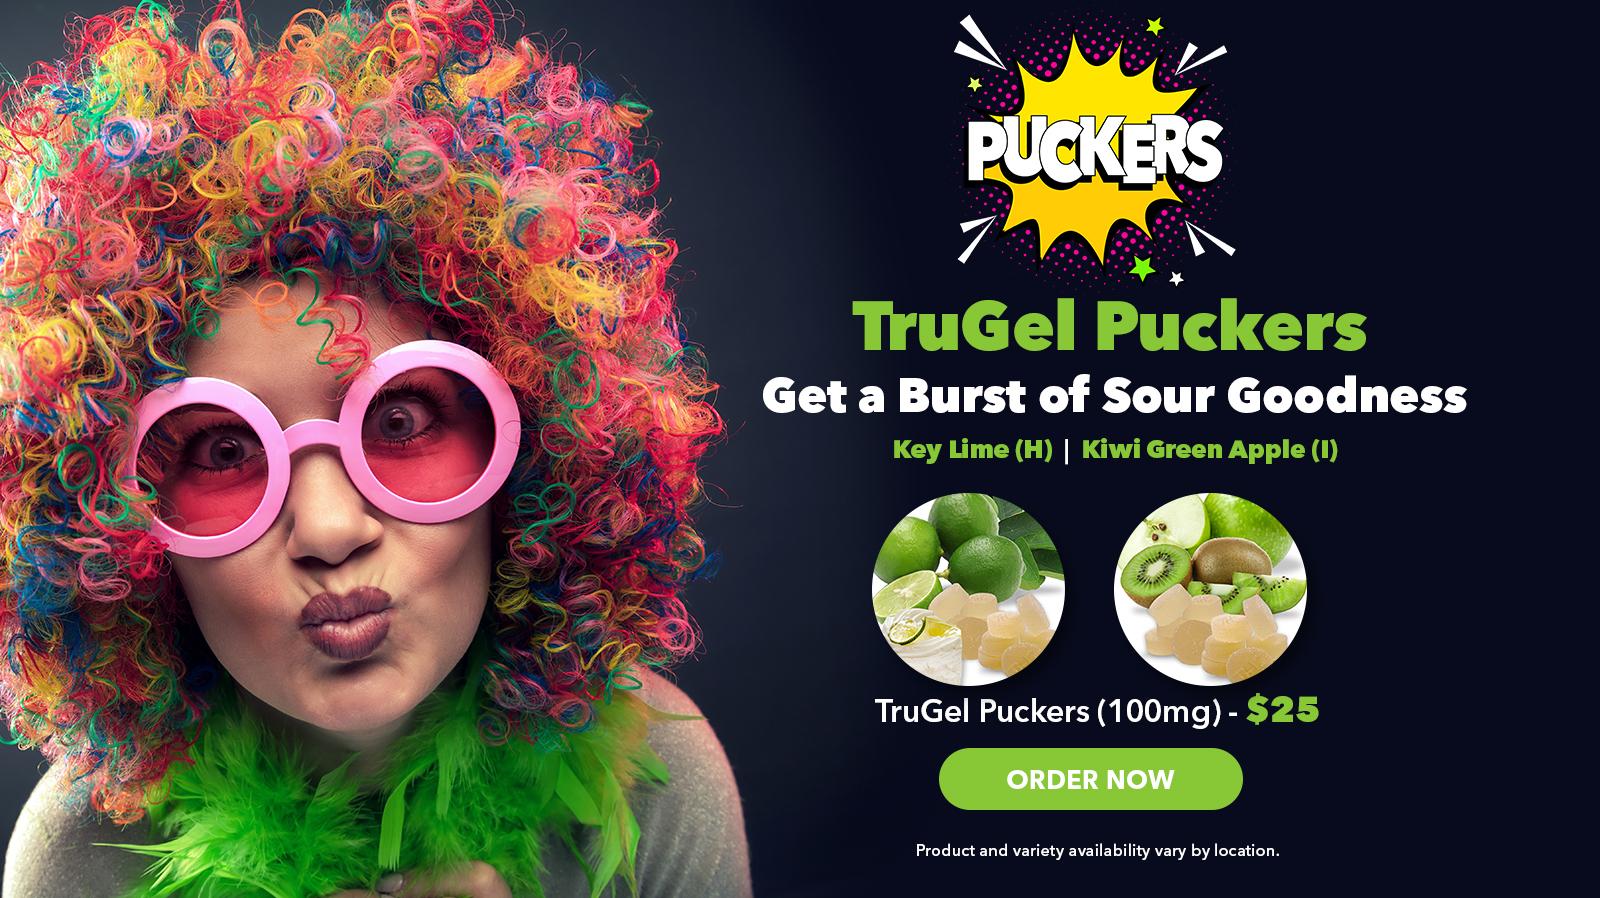 07.23 TruGel Puckers highlight